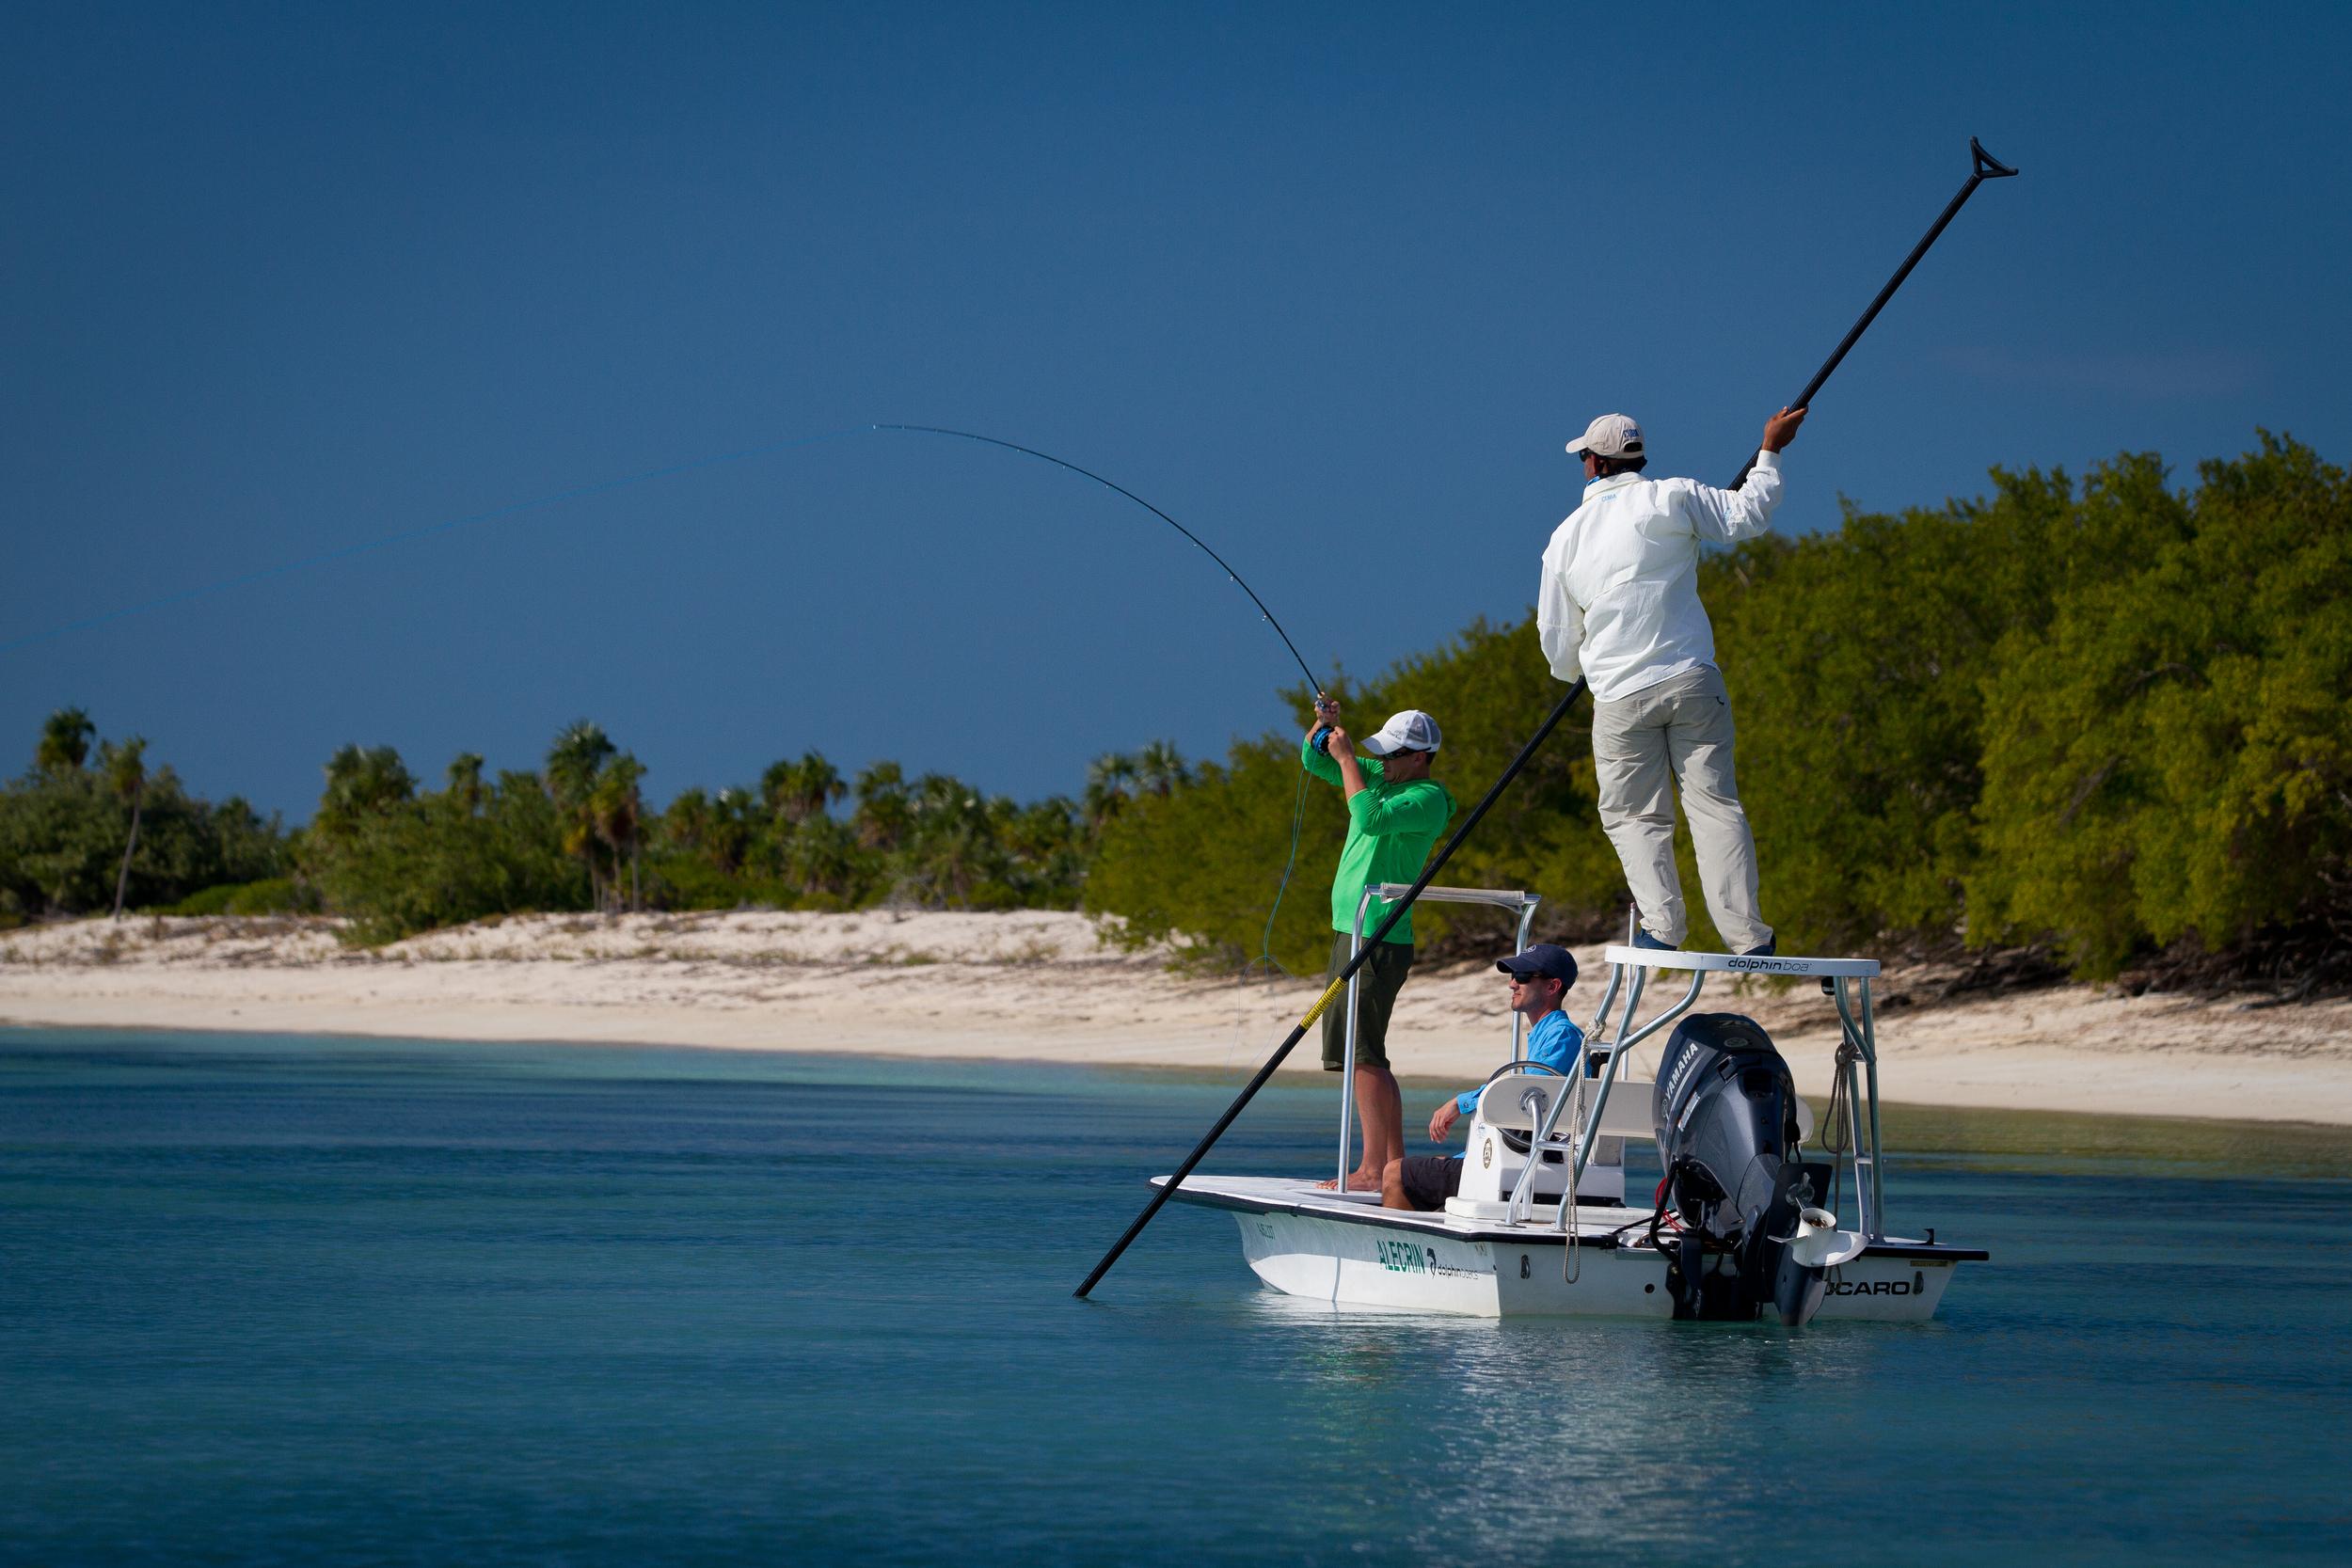 Fly Fishing for Bonefish, Jardines de la Reina, Cuba